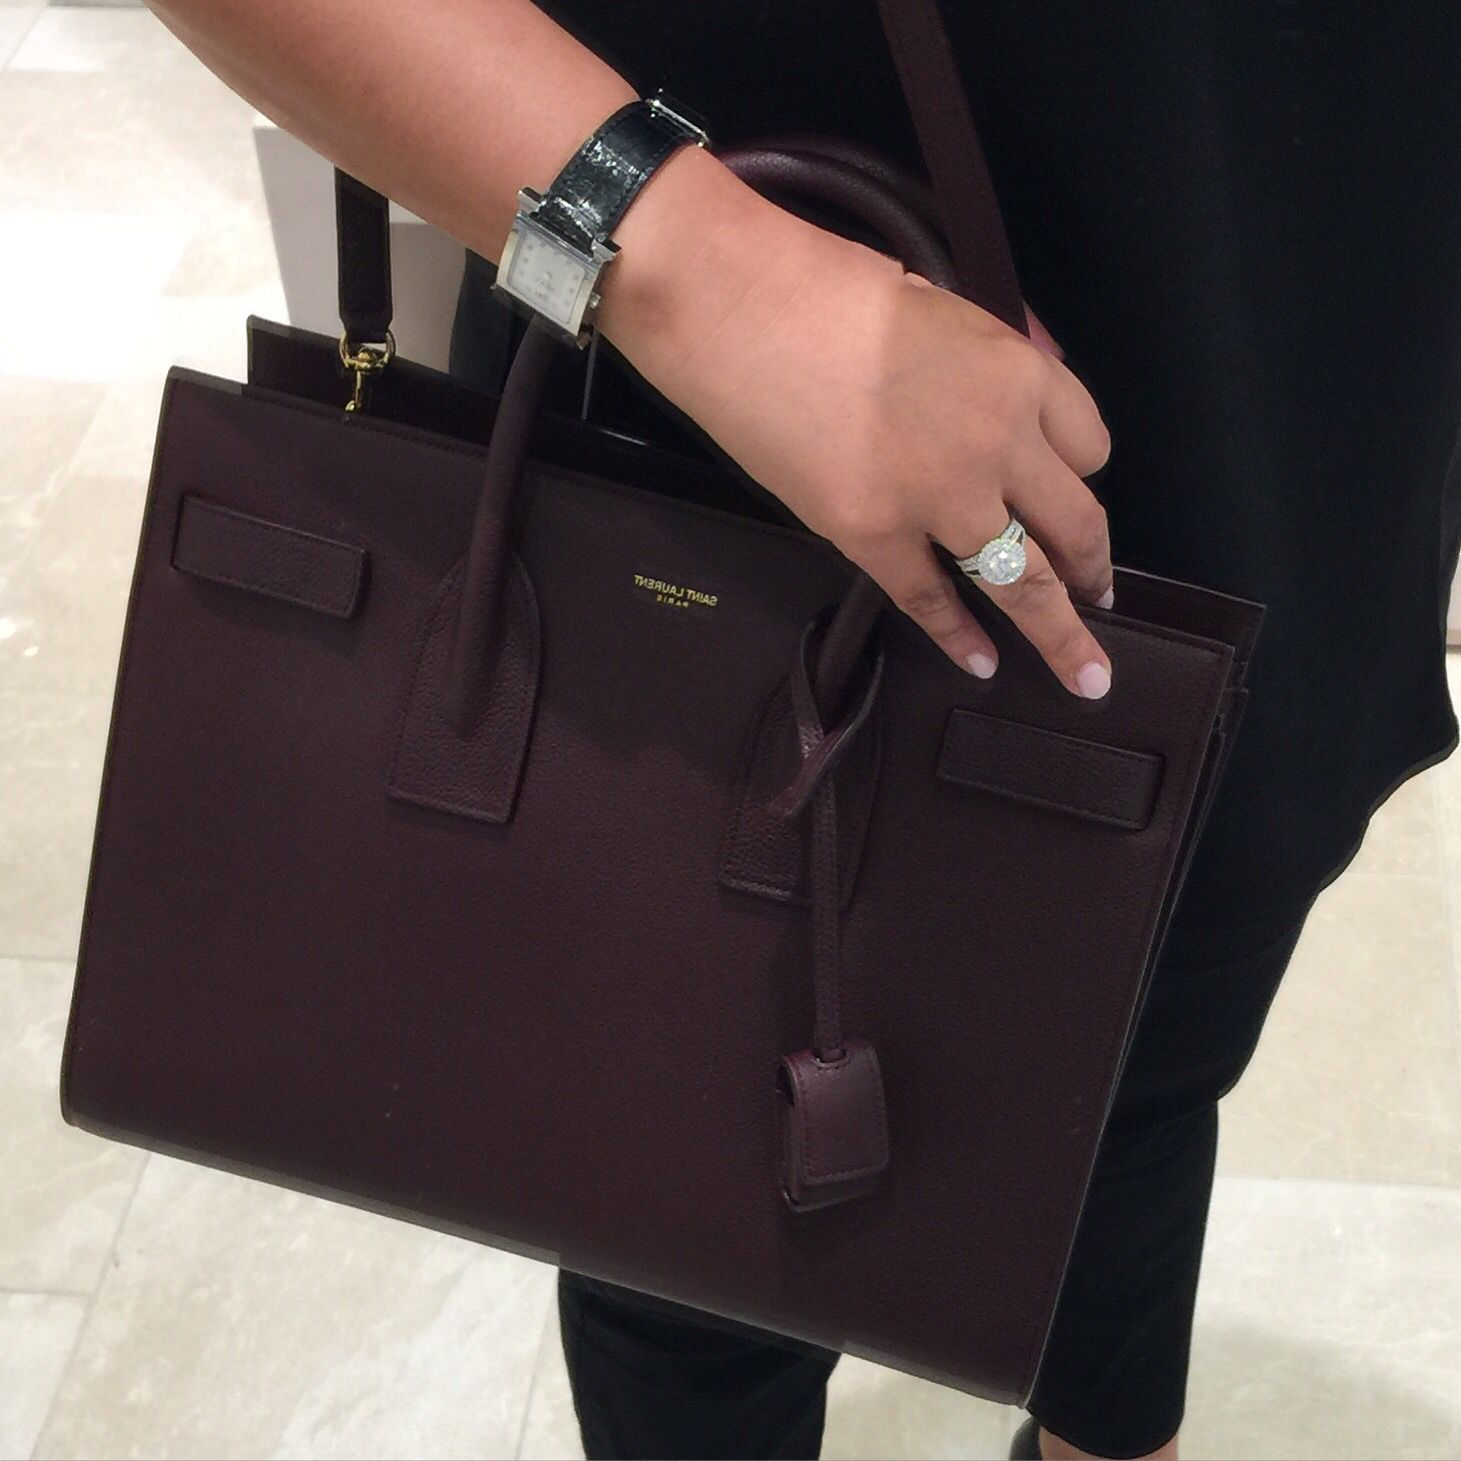 1264ec90719 Saint Laurent Sac De Jour Small grain leather Burgundy! Perfect bag for  Fall! My next bag?